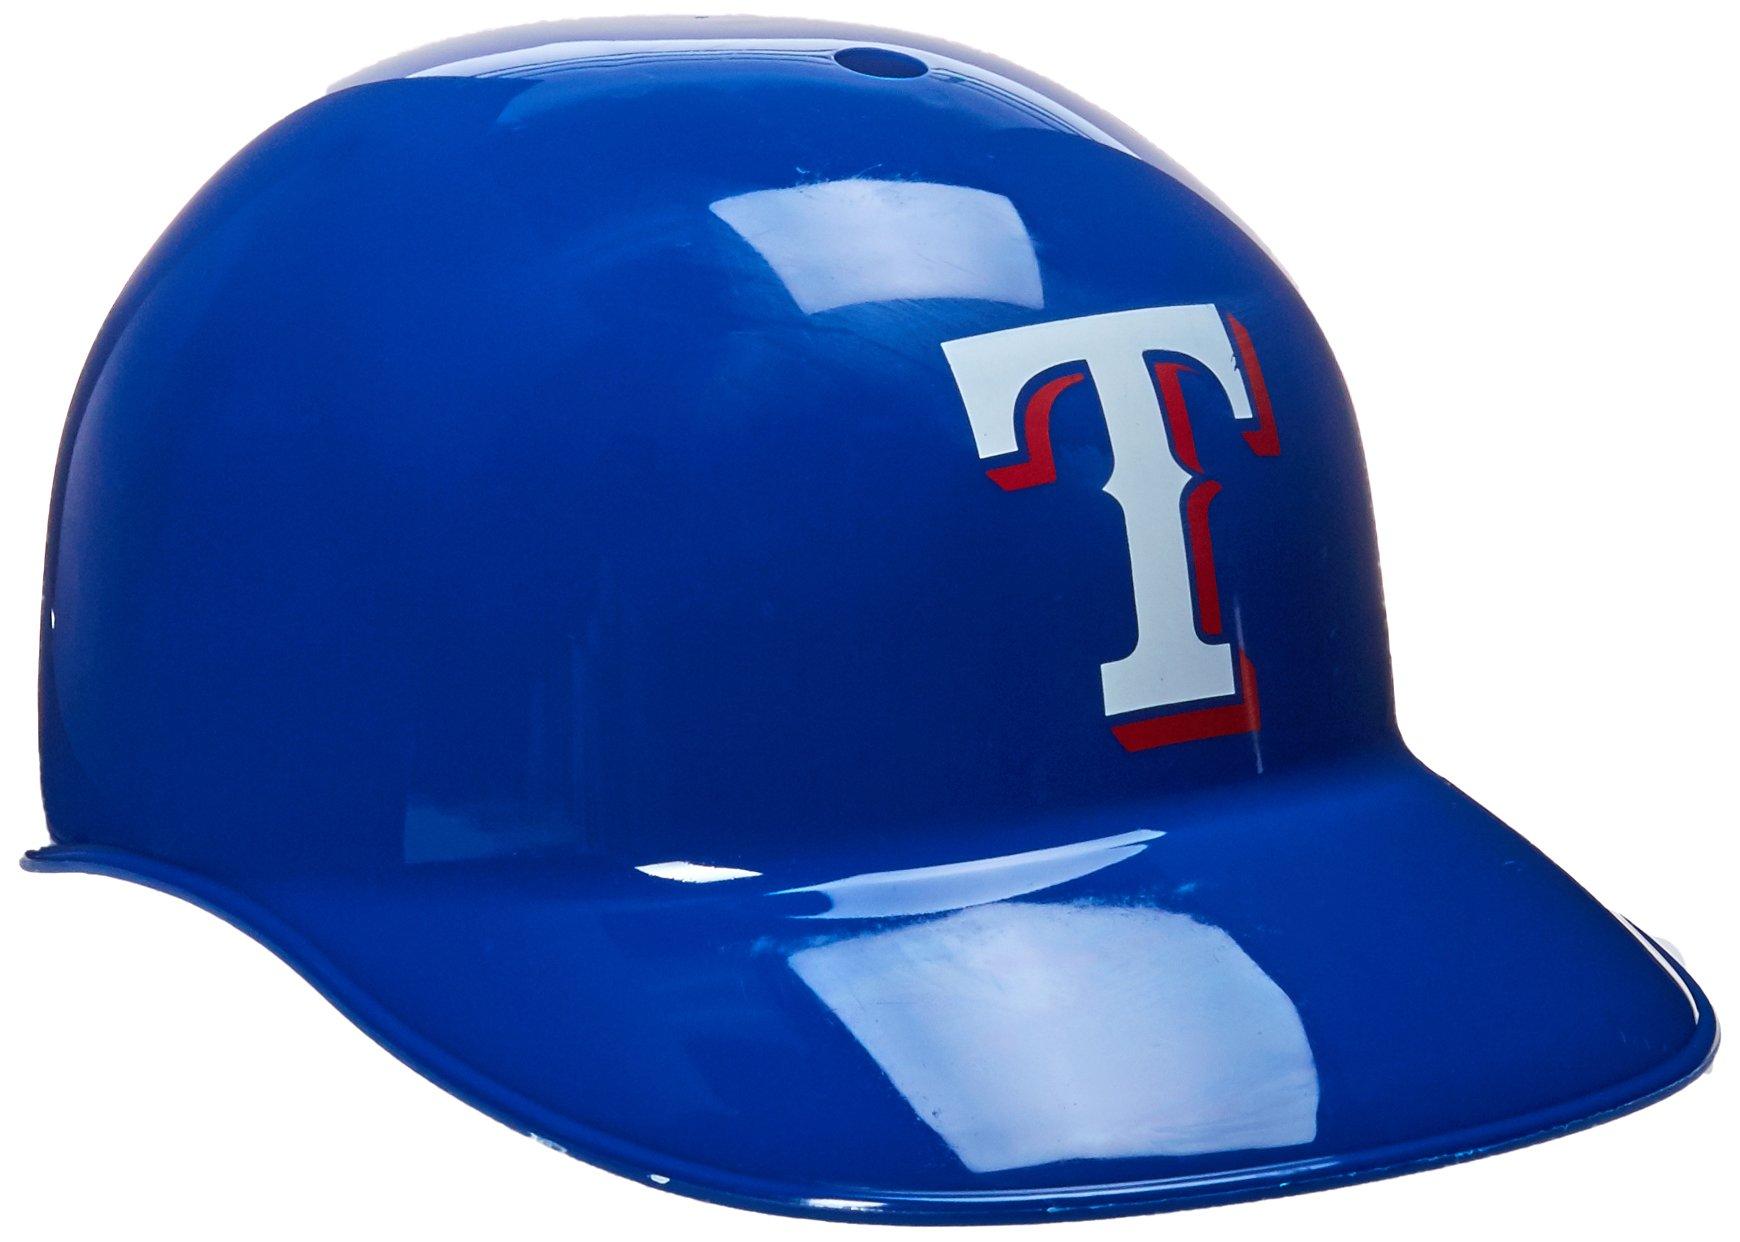 Batting Helmet Visor Stickers